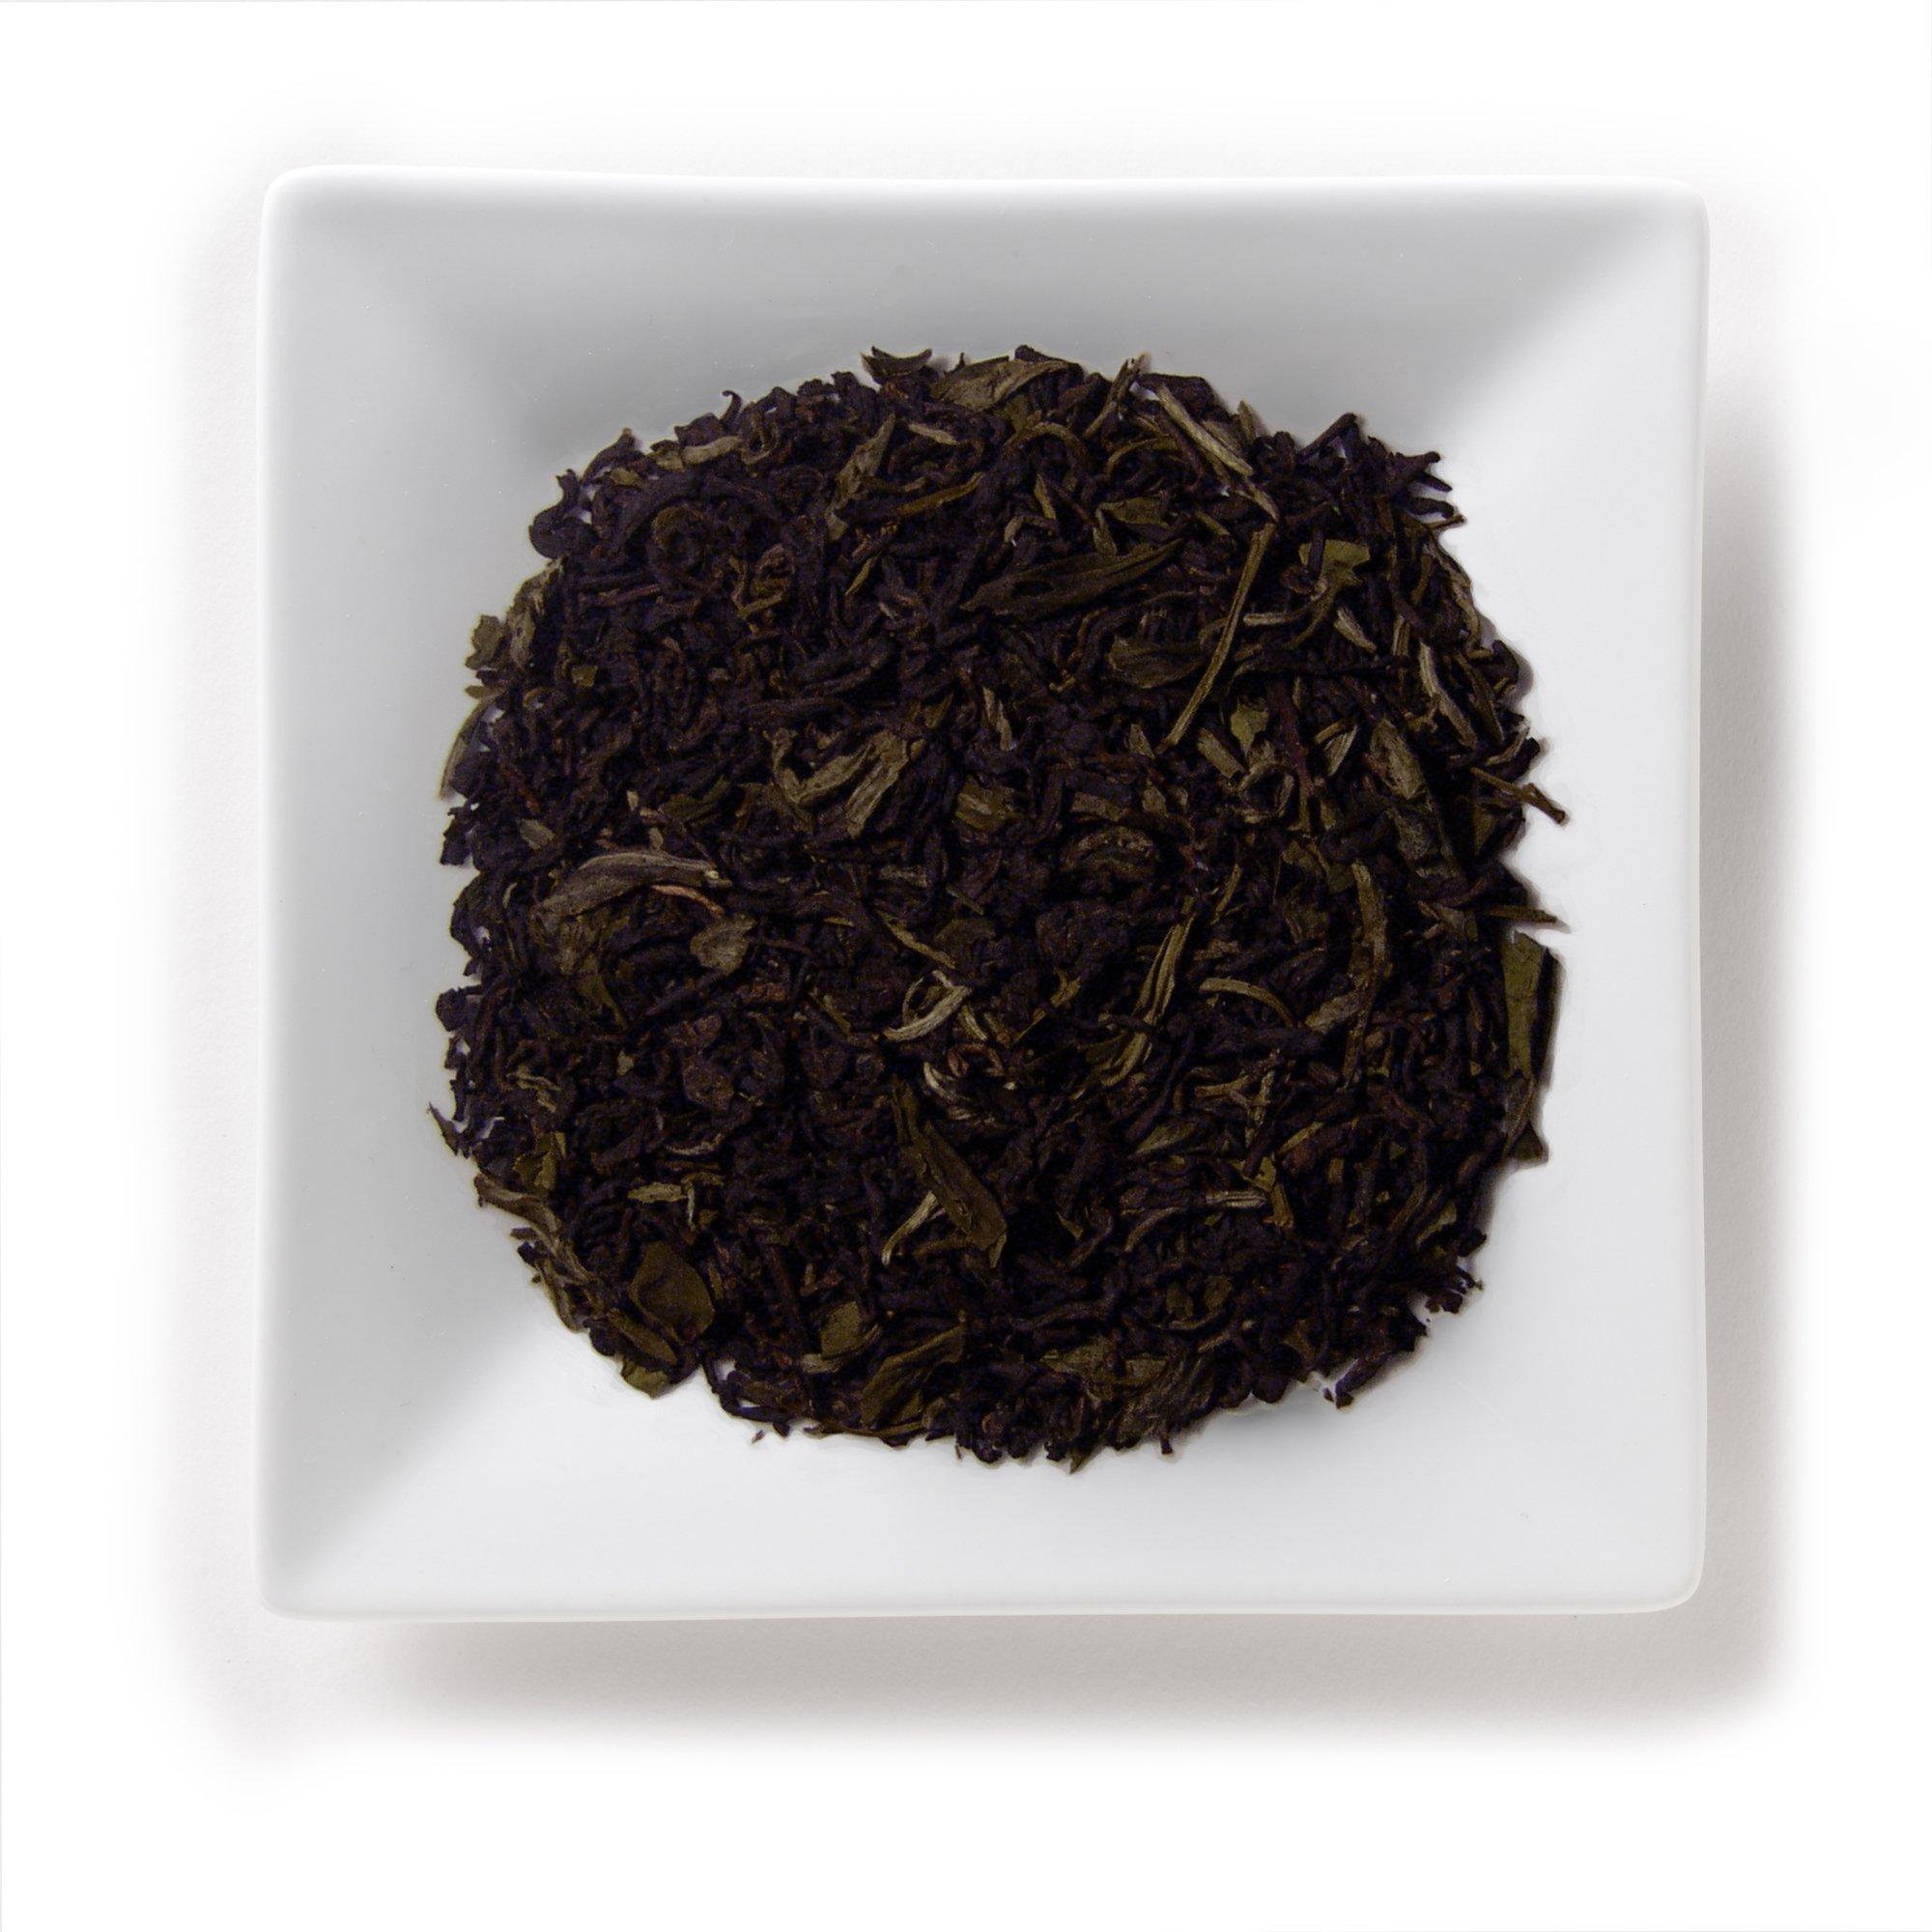 Mahamosa Earl Grey Pu-erh White Tea 2 oz (with pu-erh, bai mu dan white peony, bergamot) - Loose Leaf (Looseleaf) Earl Grey Black and White Tea Blend